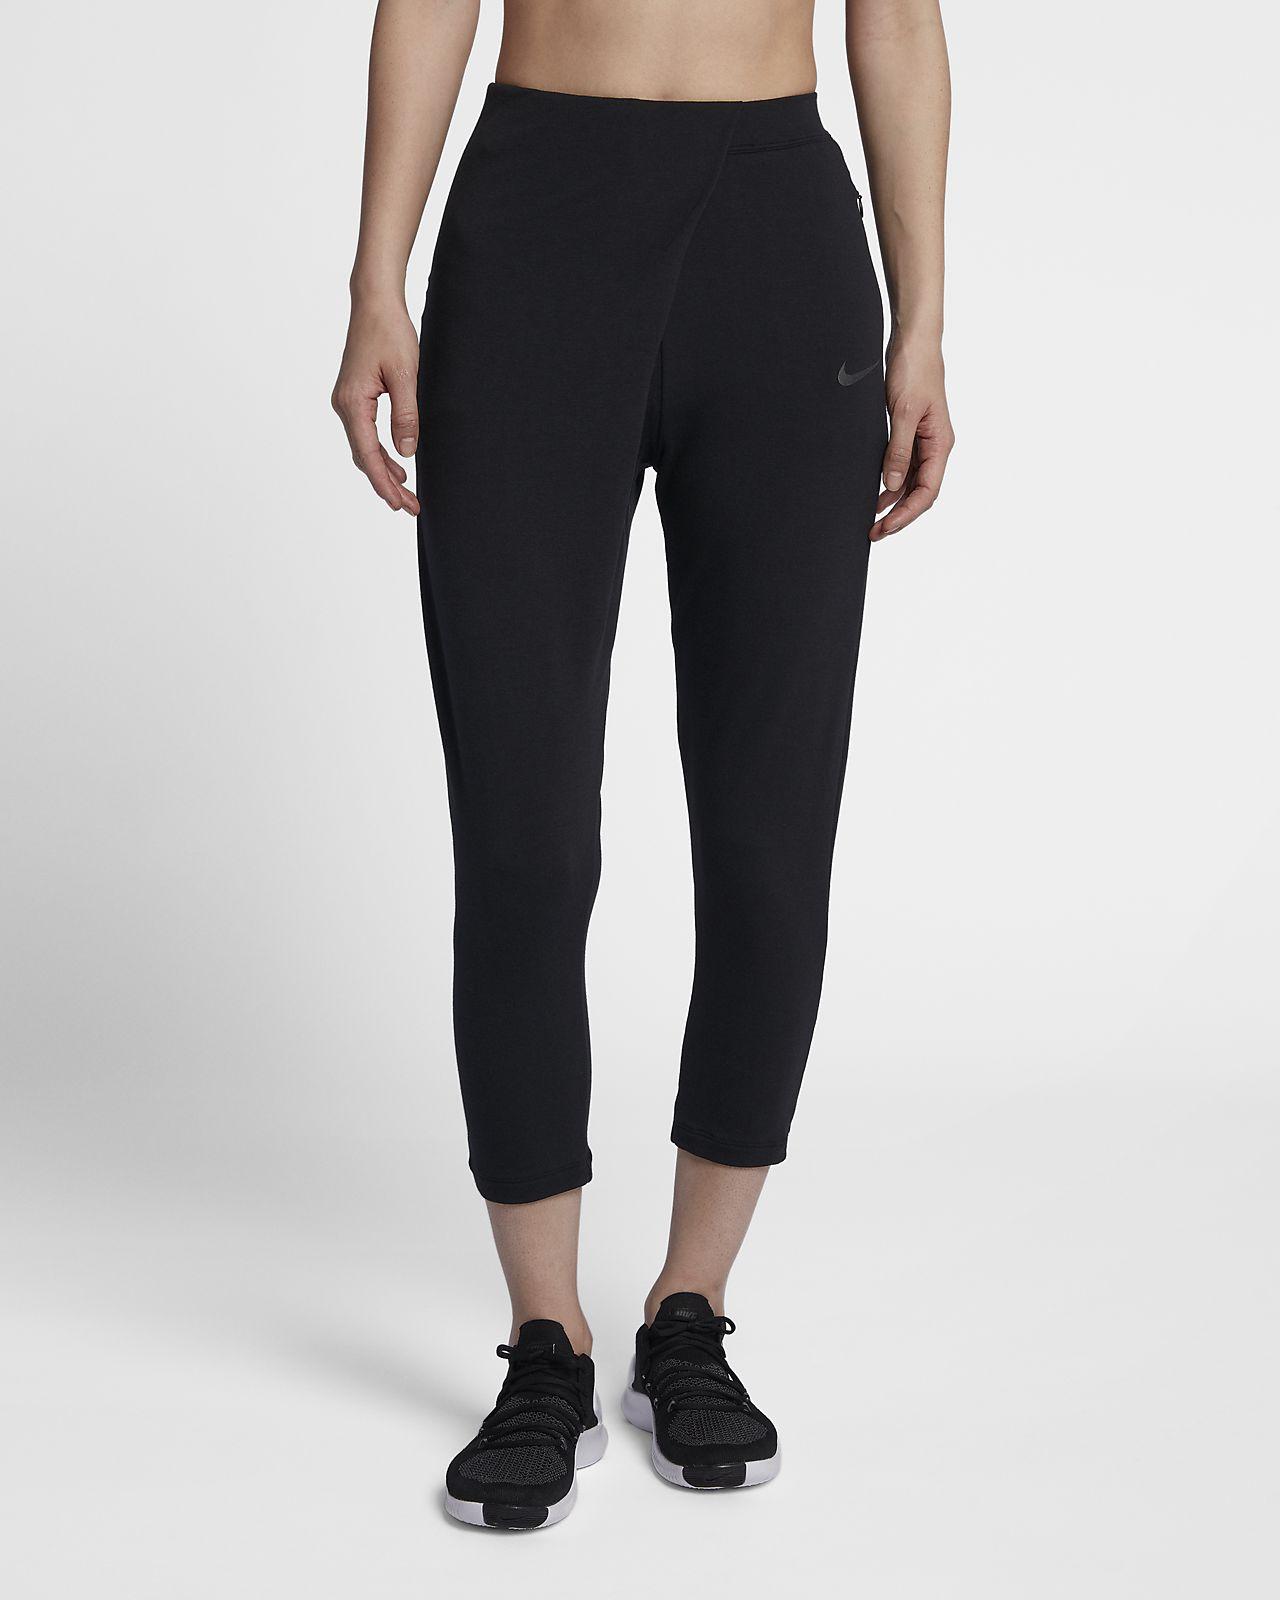 Dri Donna Studio Da Training Vita A Fit Media Pantaloni Nike wYvPzxPq